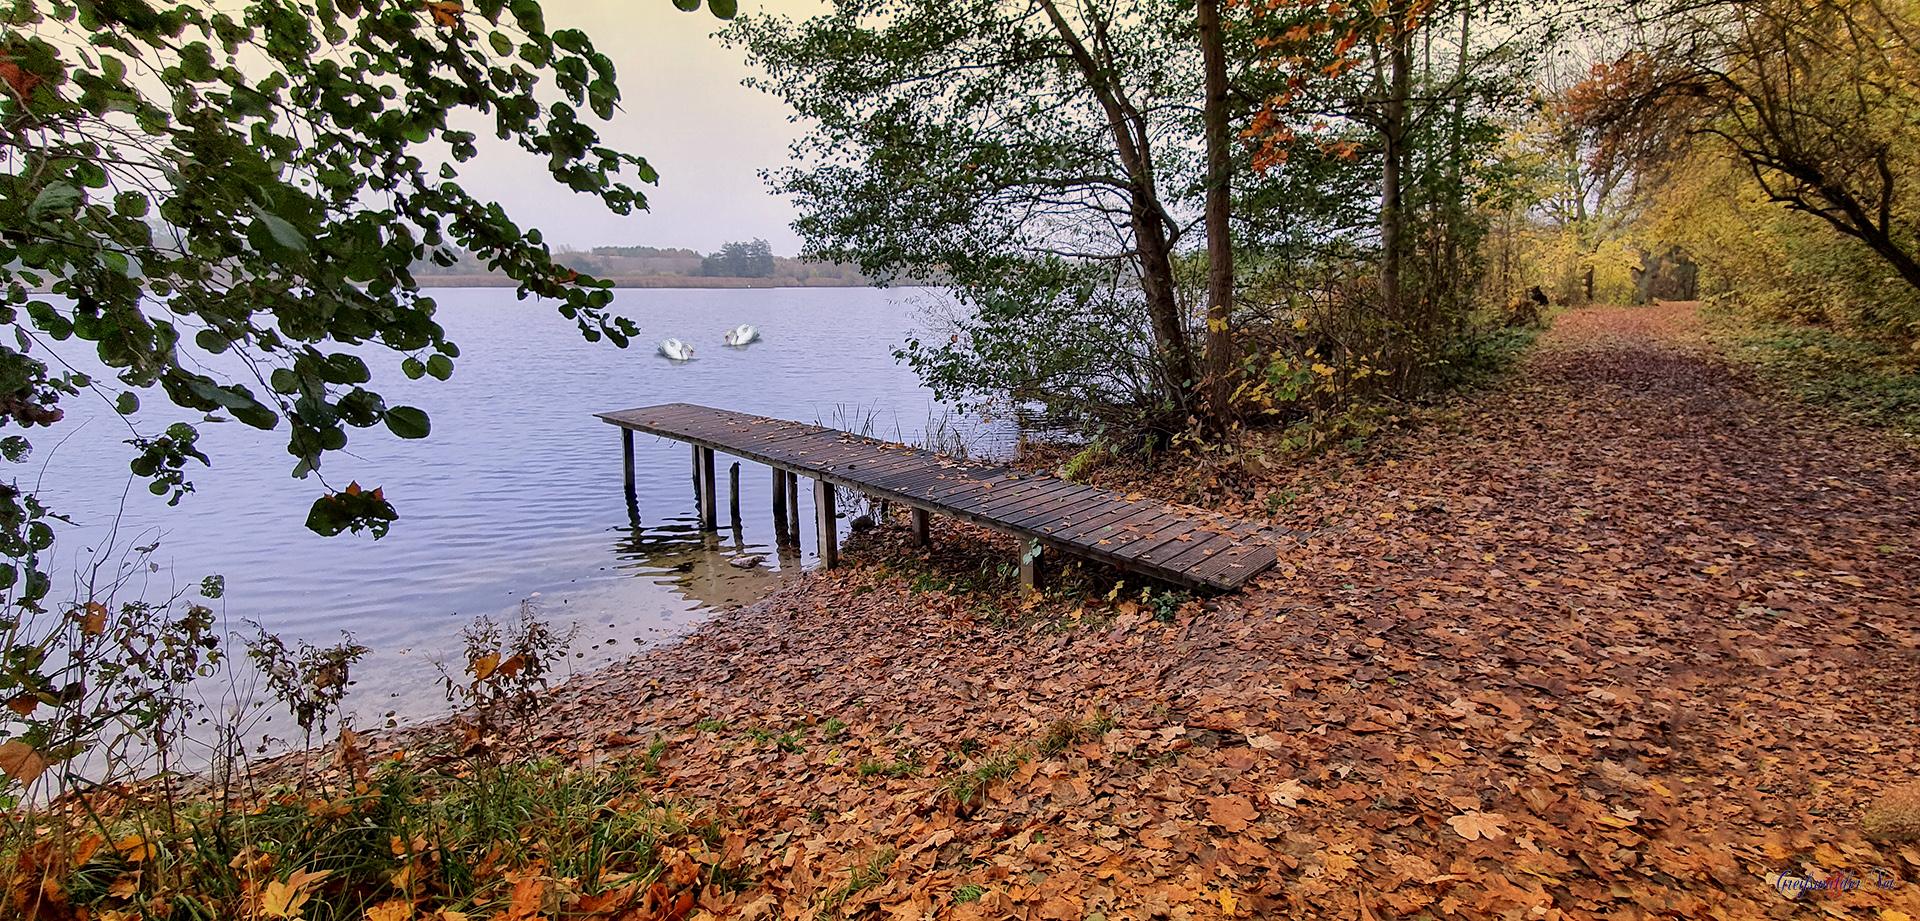 Novemberwetter am See, Kosenowsee Gützkow